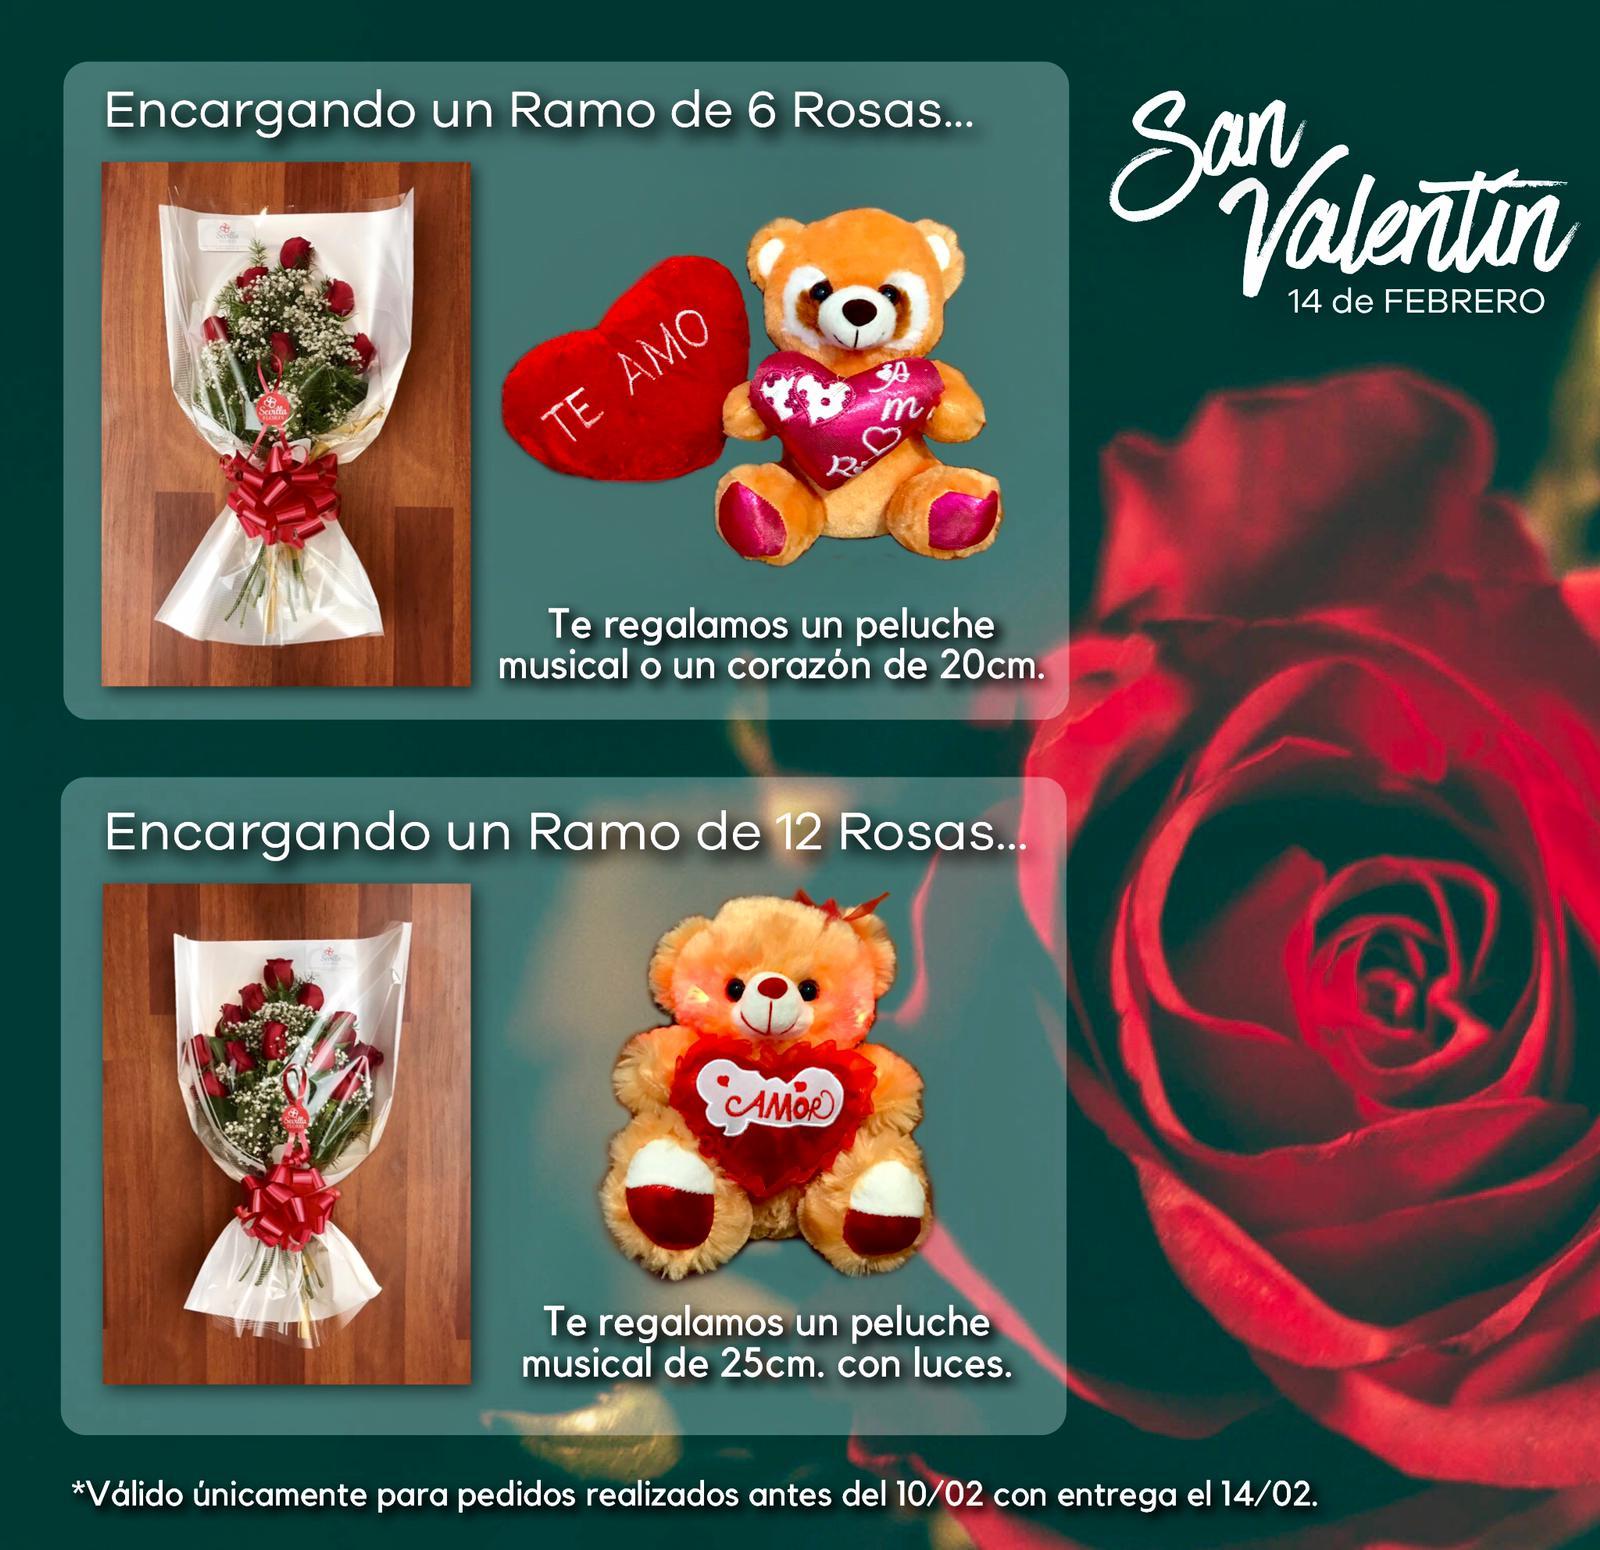 San Valentín Sevilla Flores promo